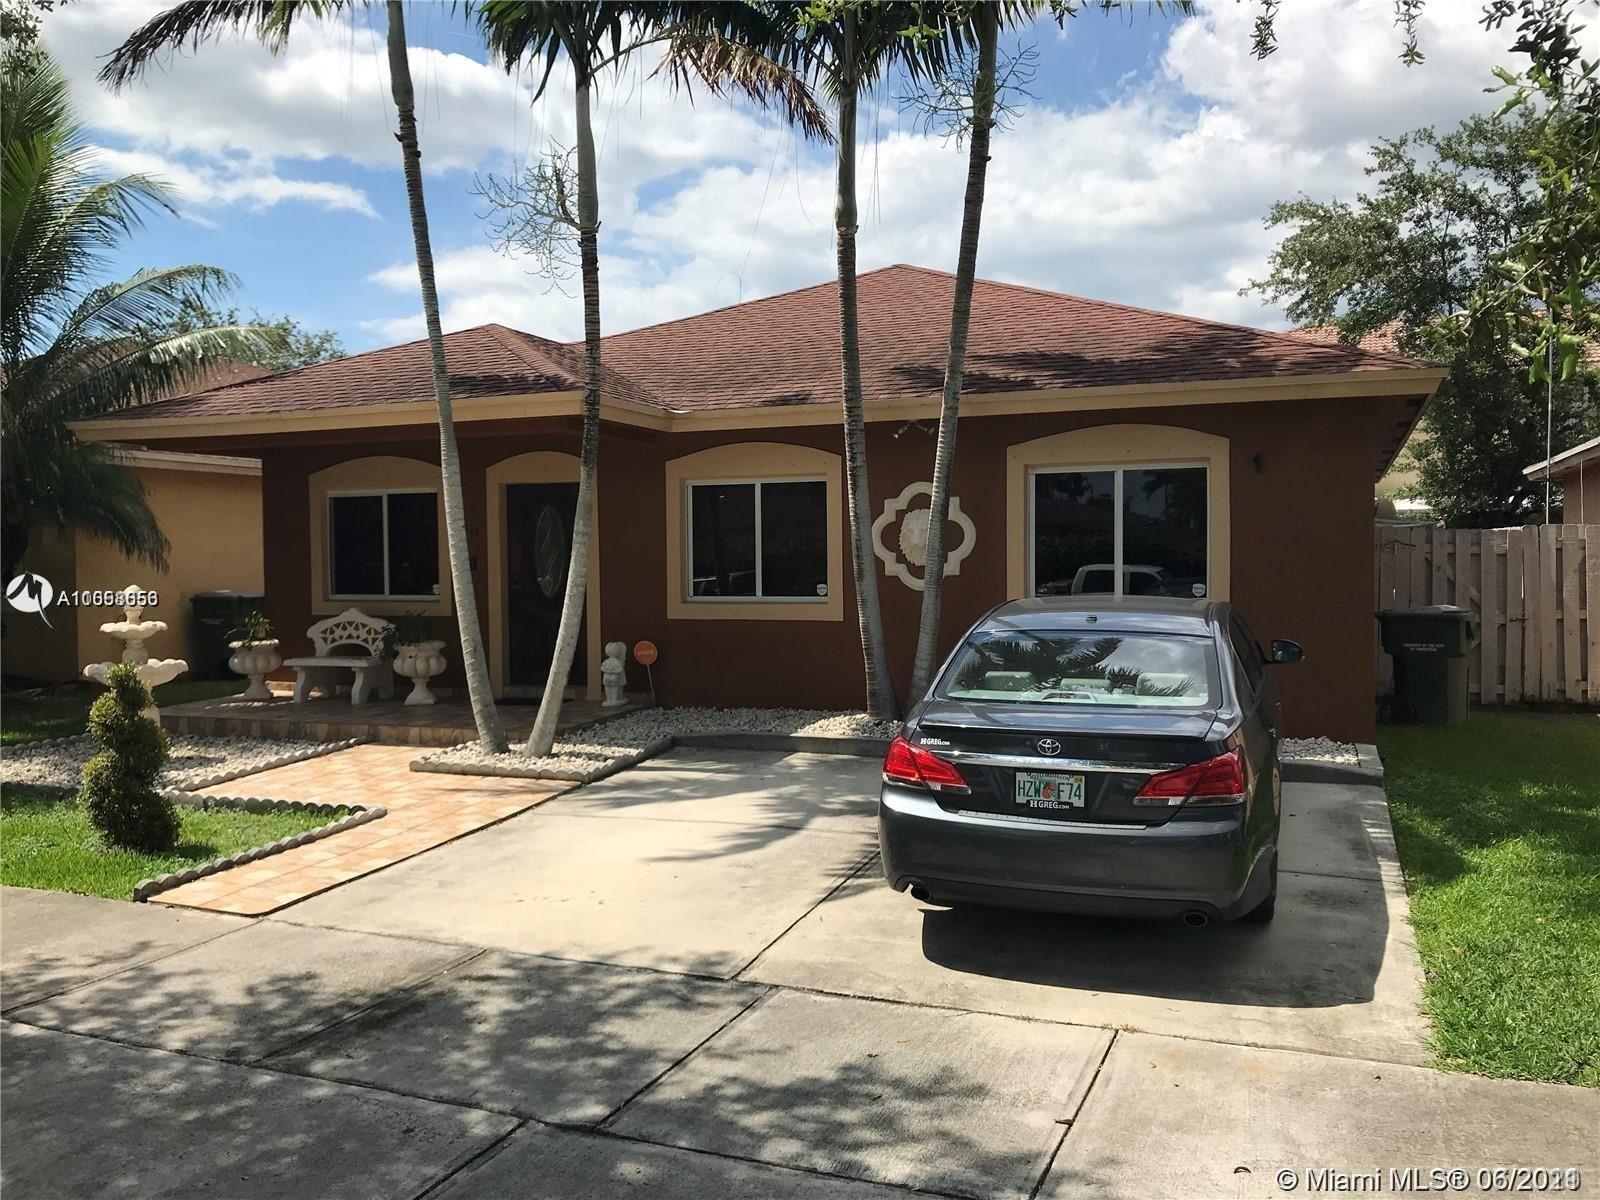 1519 SW 2nd Ct, Homestead, FL 33030 - #: A11058656